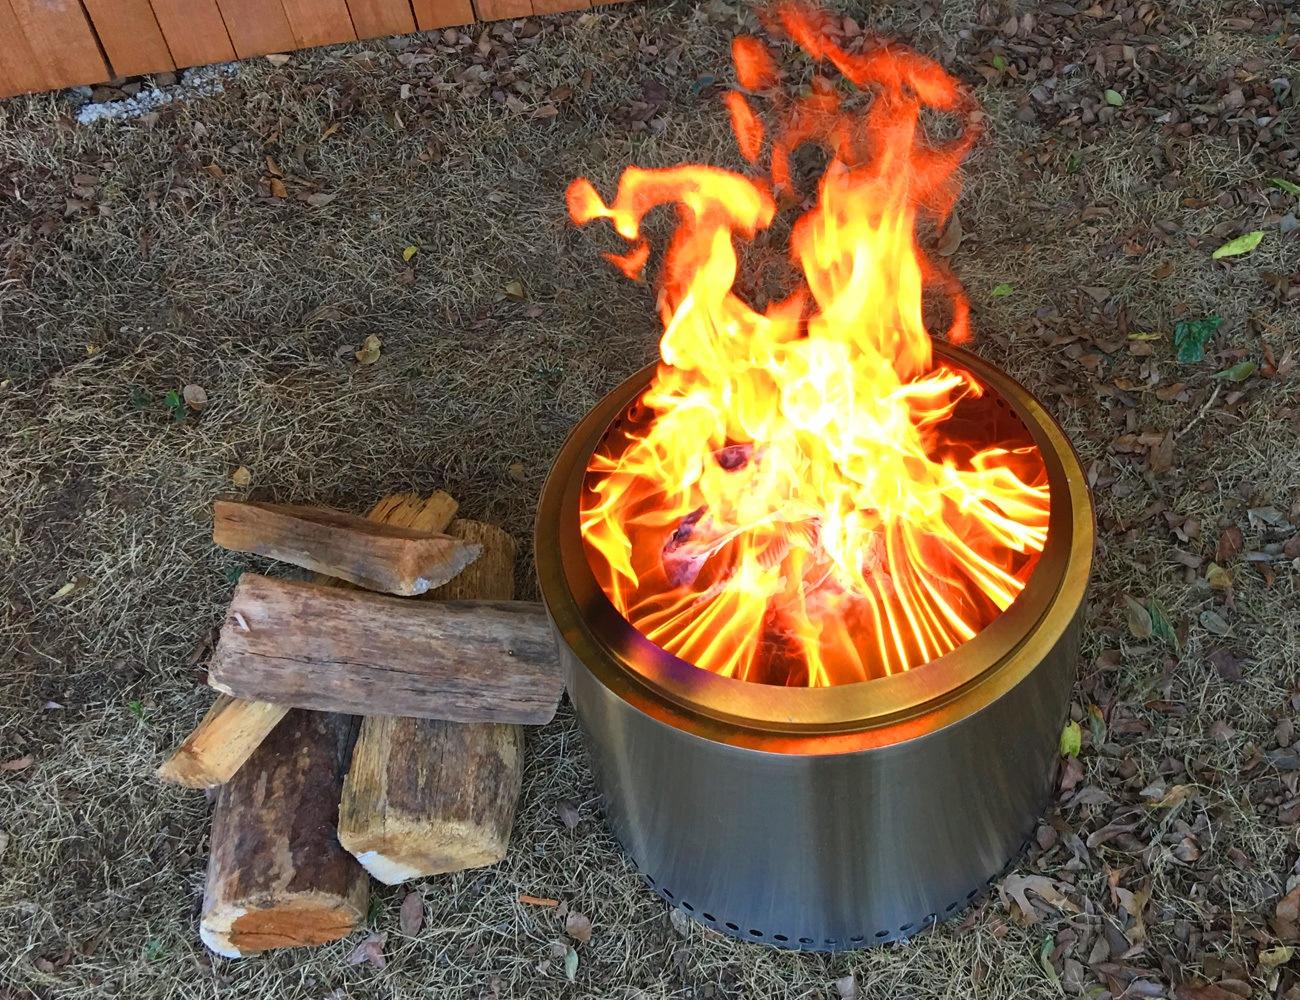 Best Wood Burning Fire Pits Bestoutdoorfirepits in dimensions 1300 X 1000